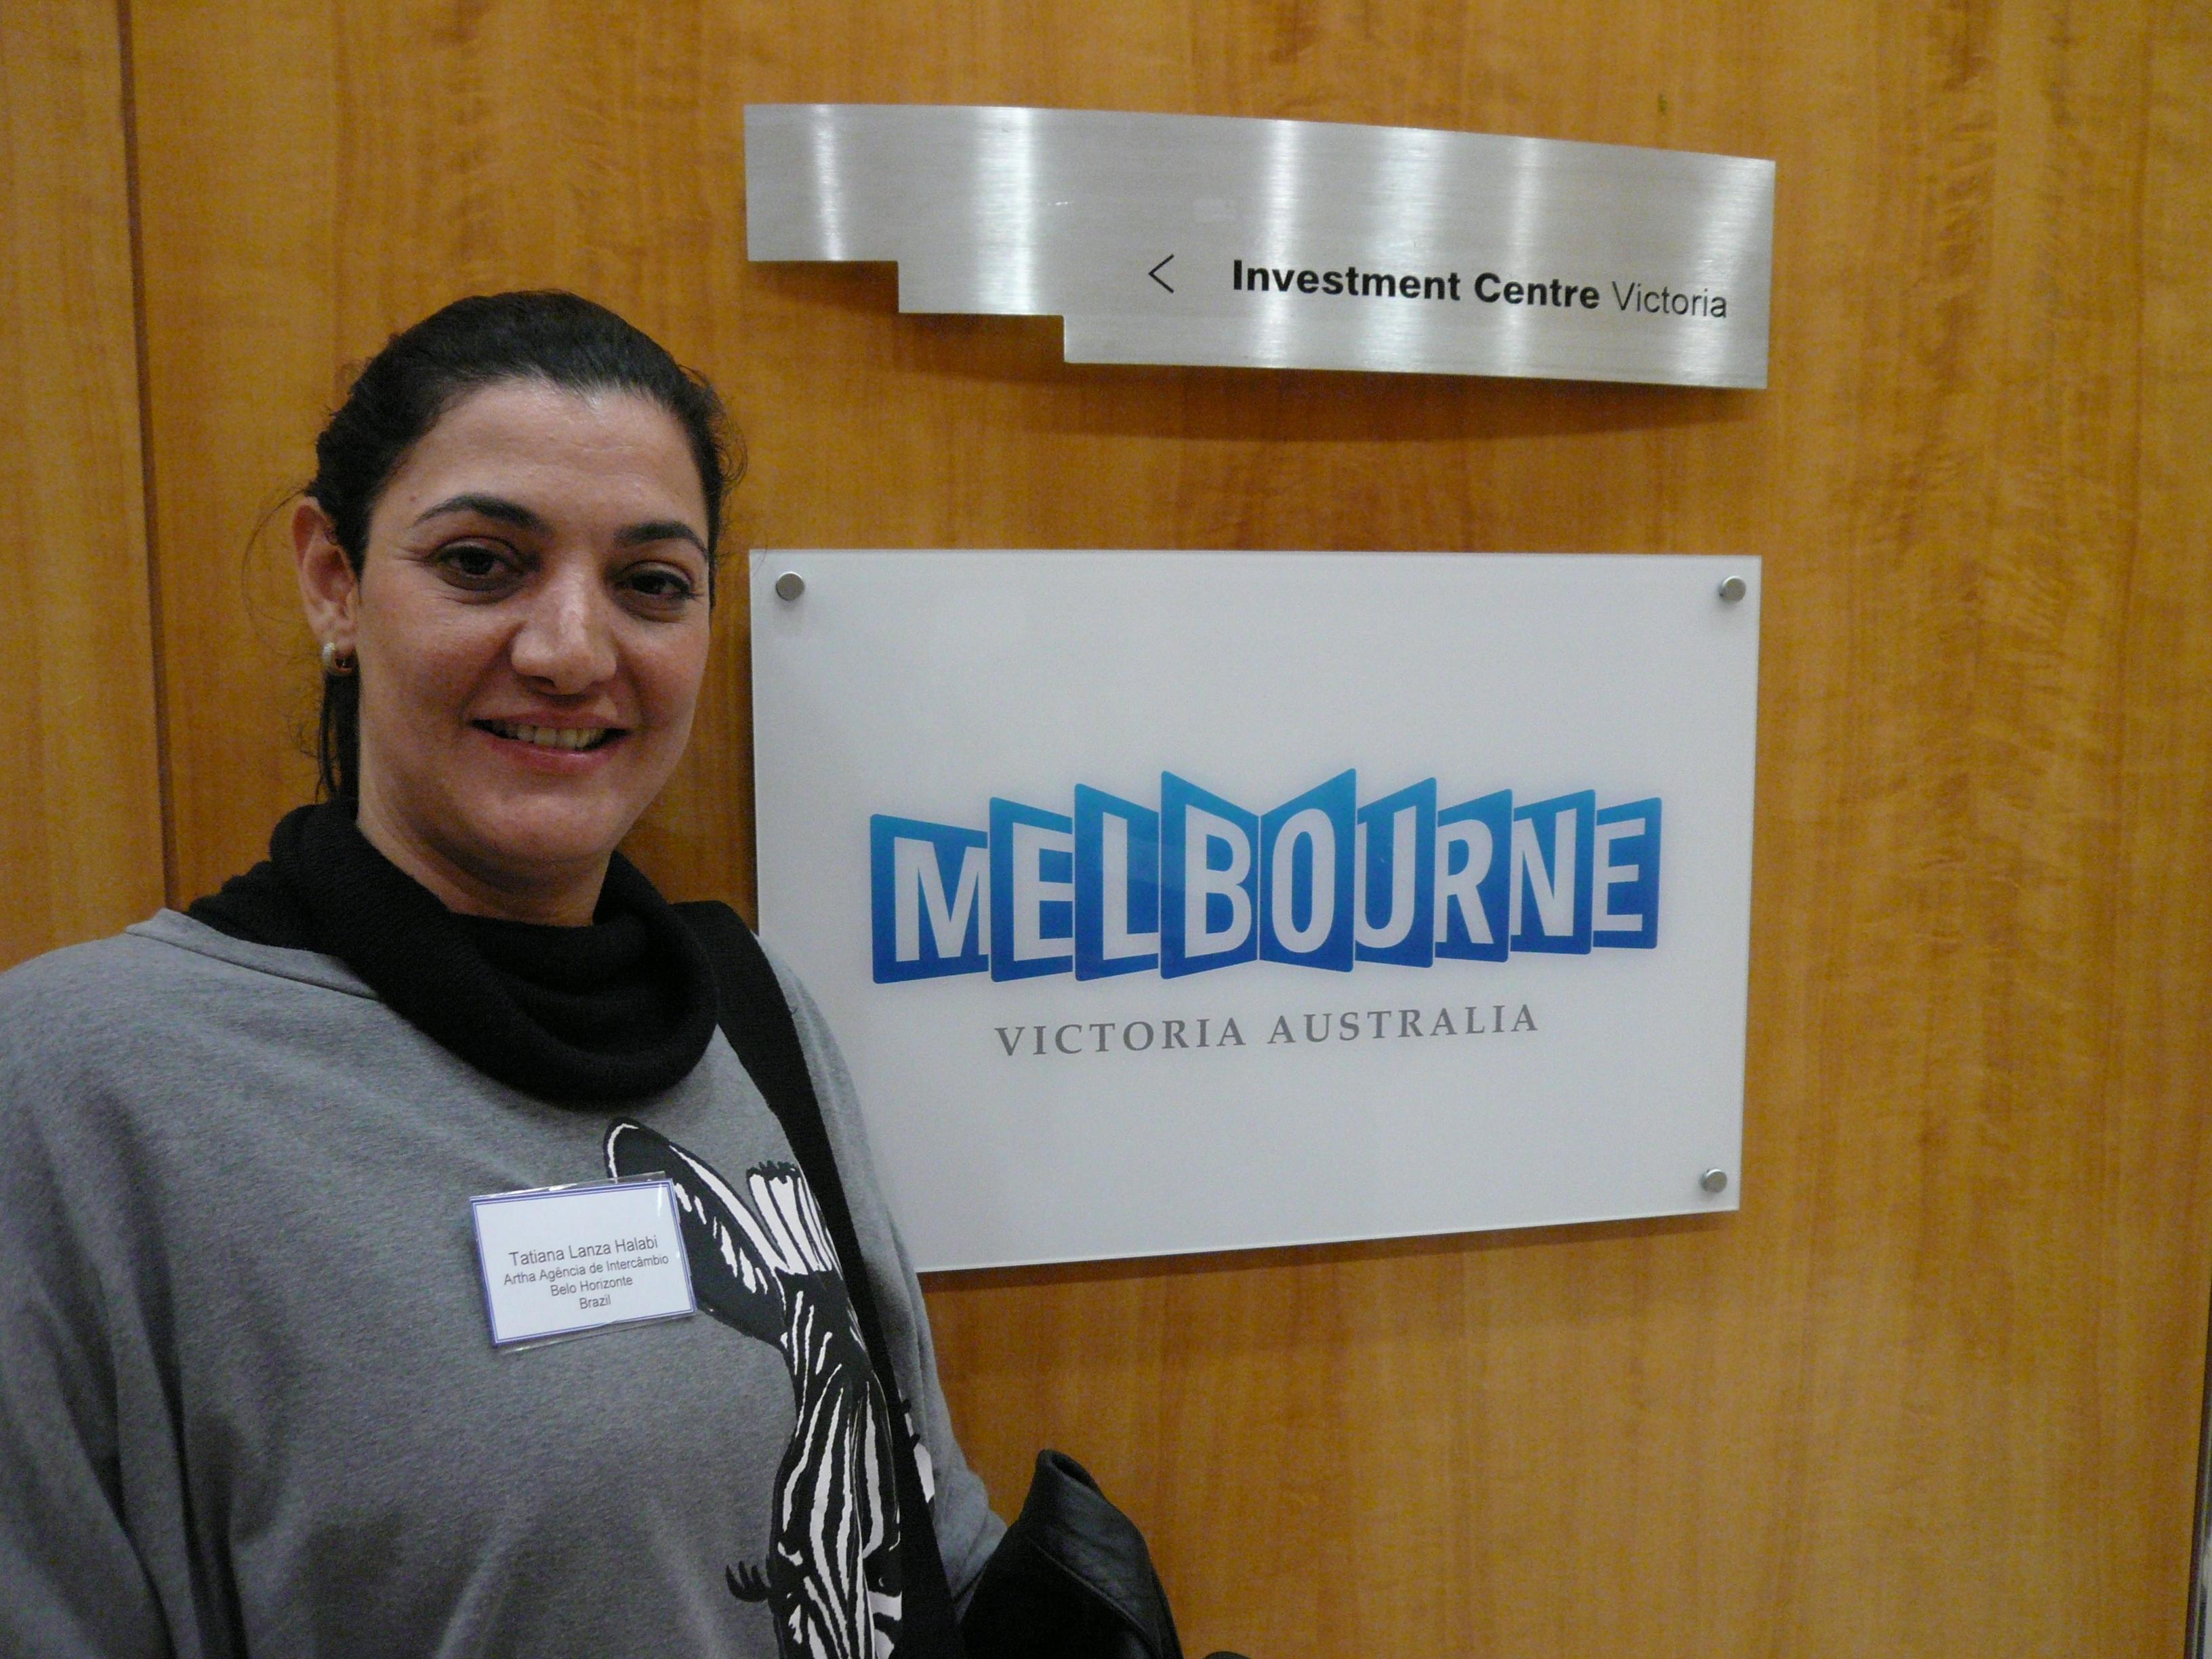 Network_Victoria_Education_Melbourne (15)